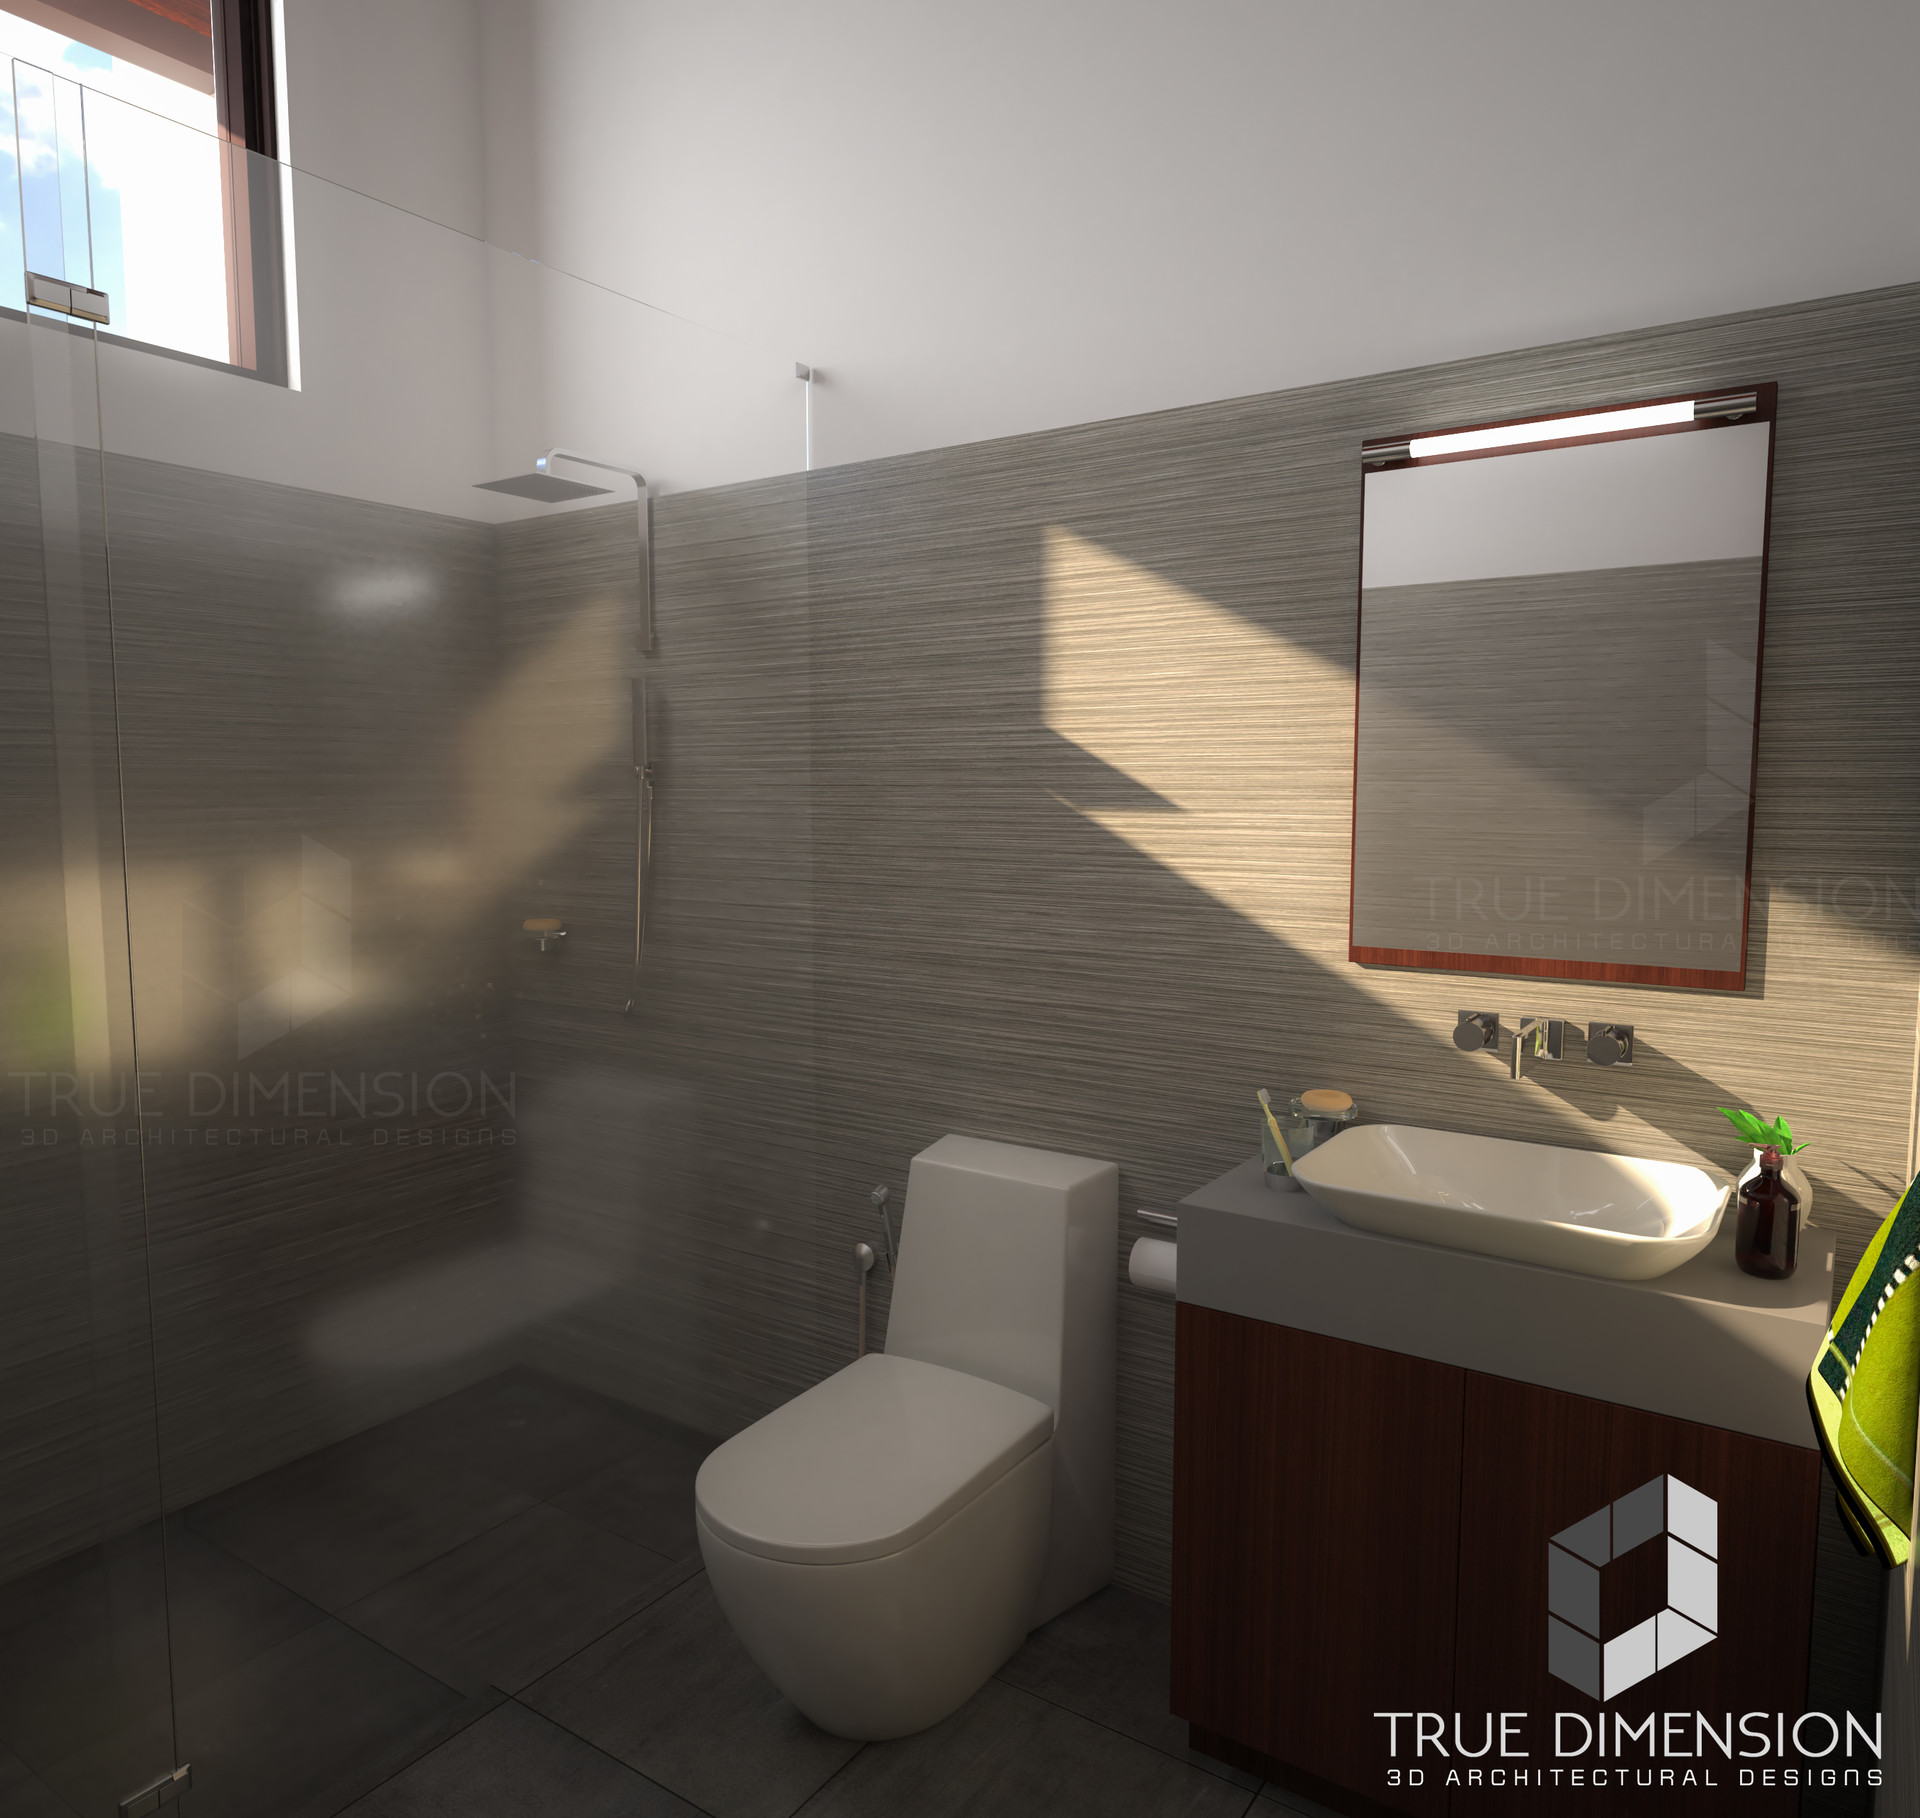 Colombo Sri Lanka Tile Designs: Low Cost Bathroom Designs In Sri Lanka